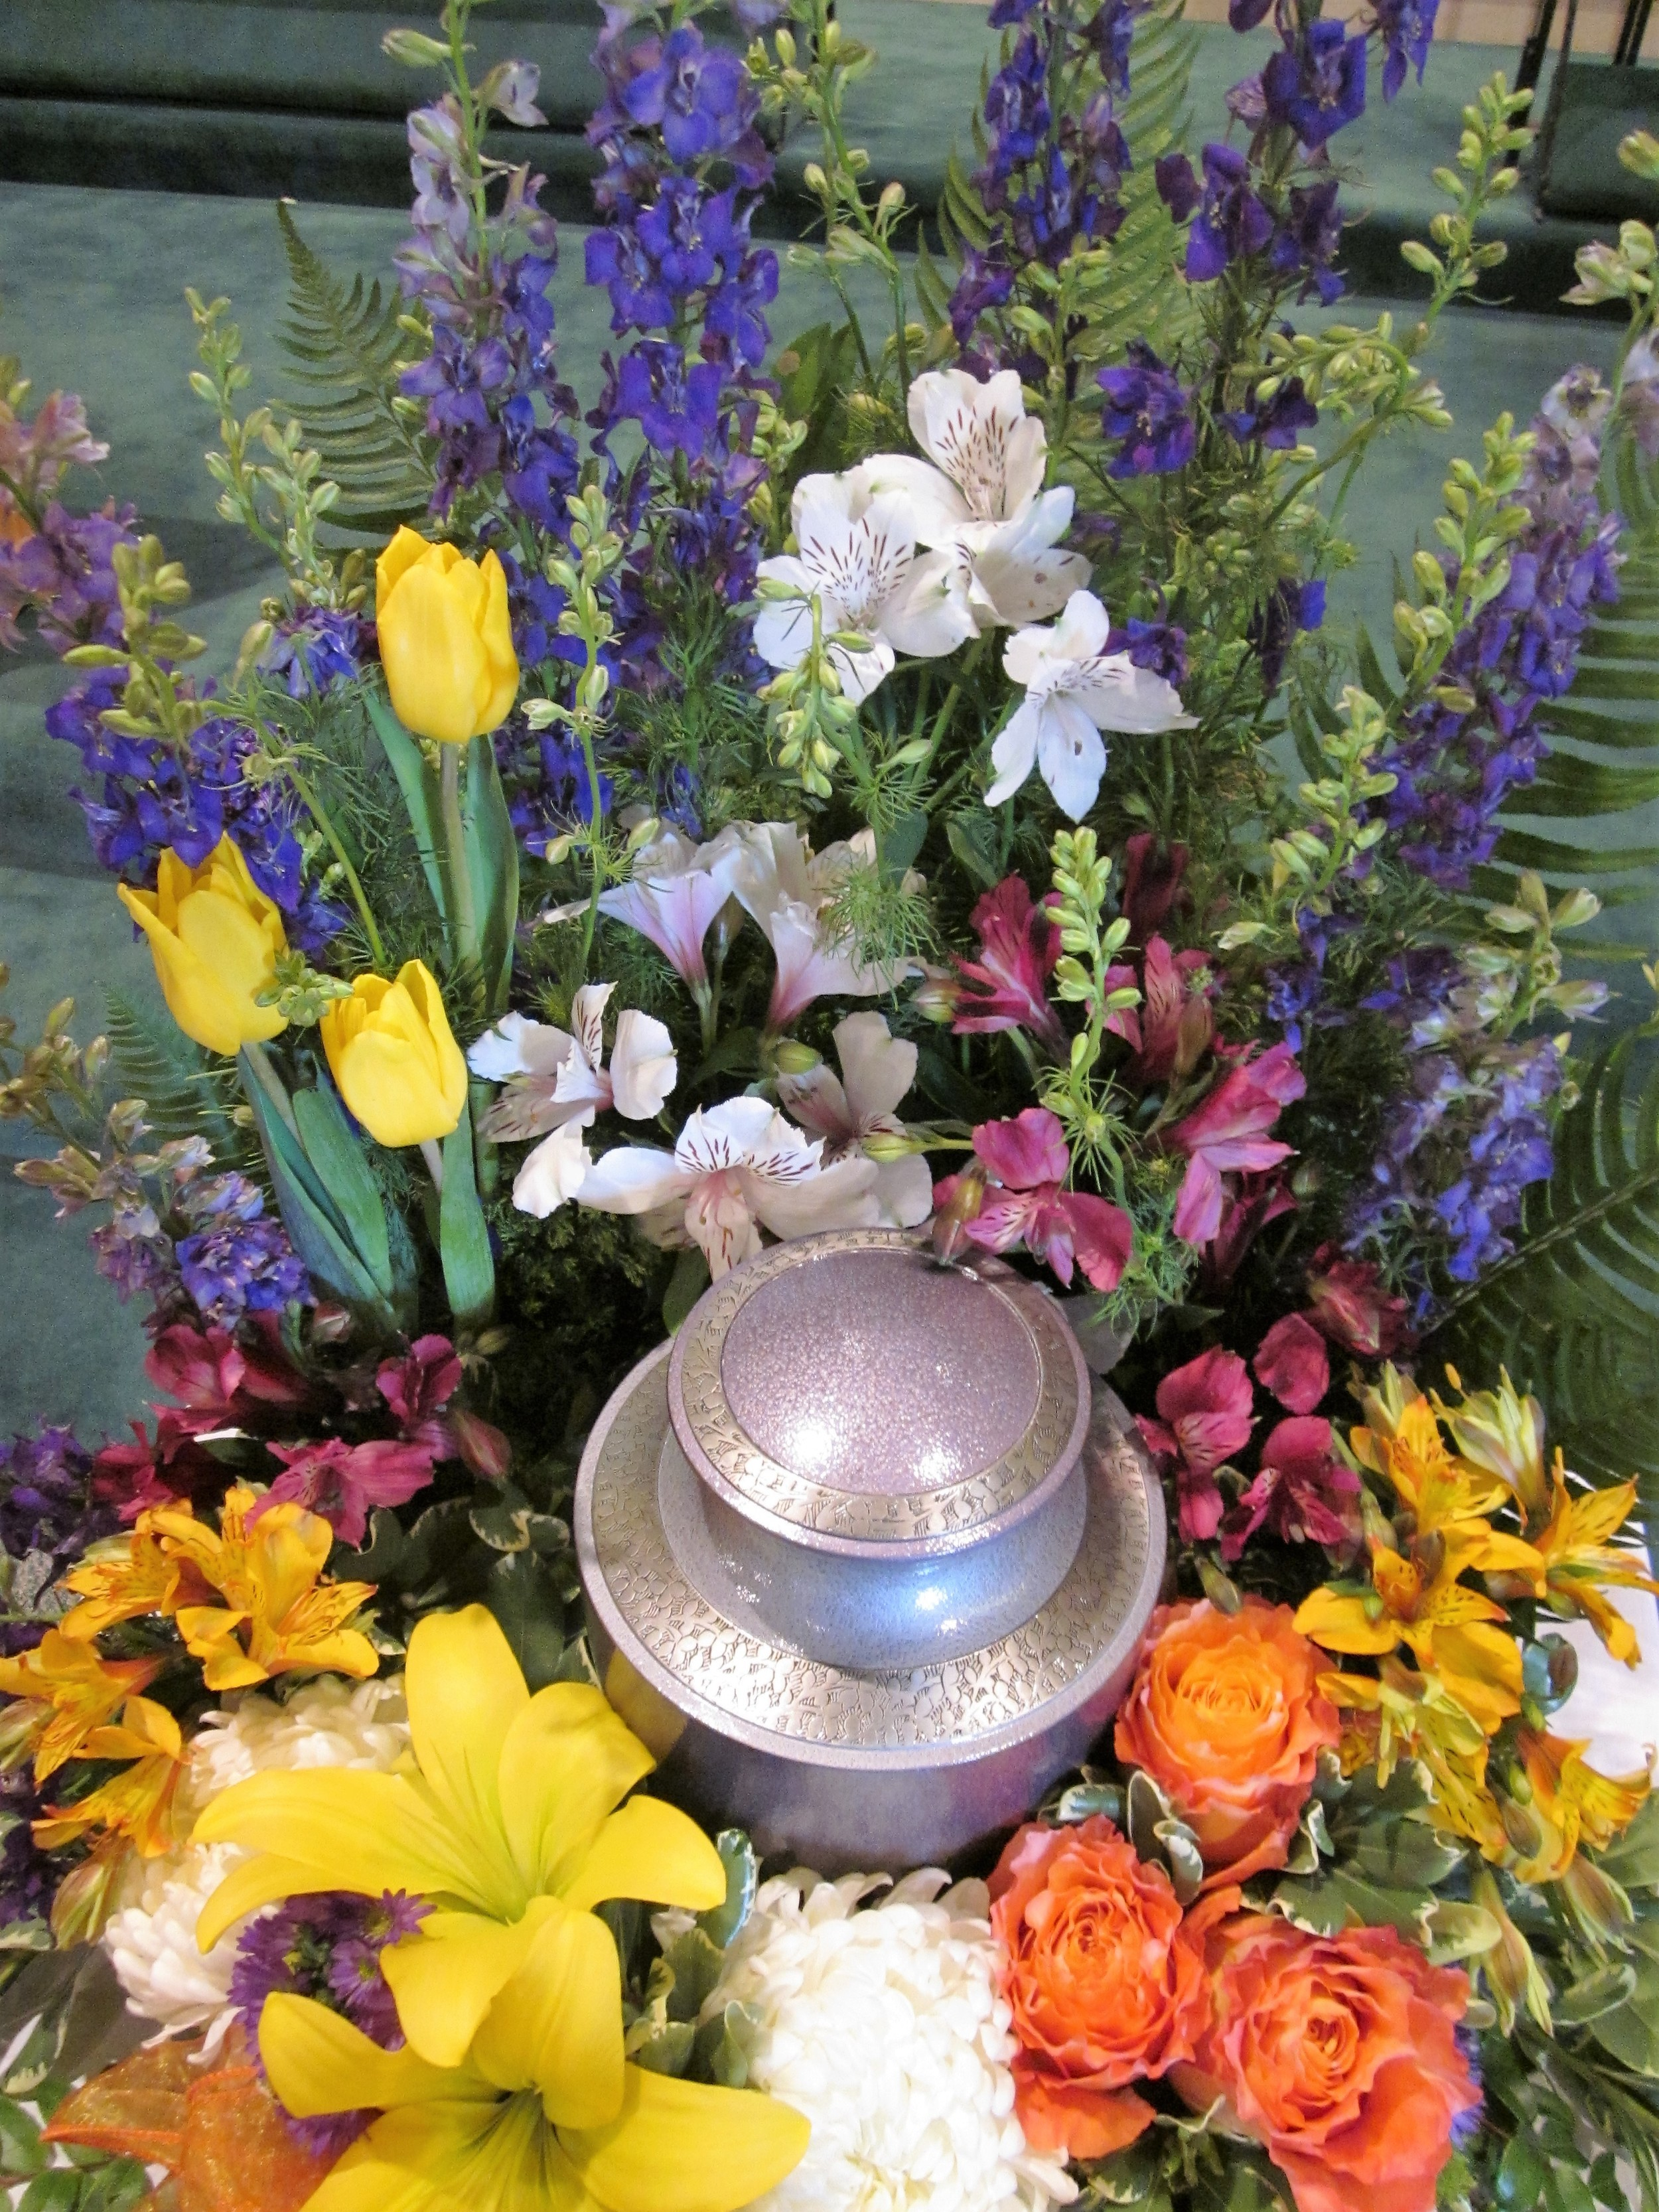 #13 Urn surround, color blocked multi bright florals